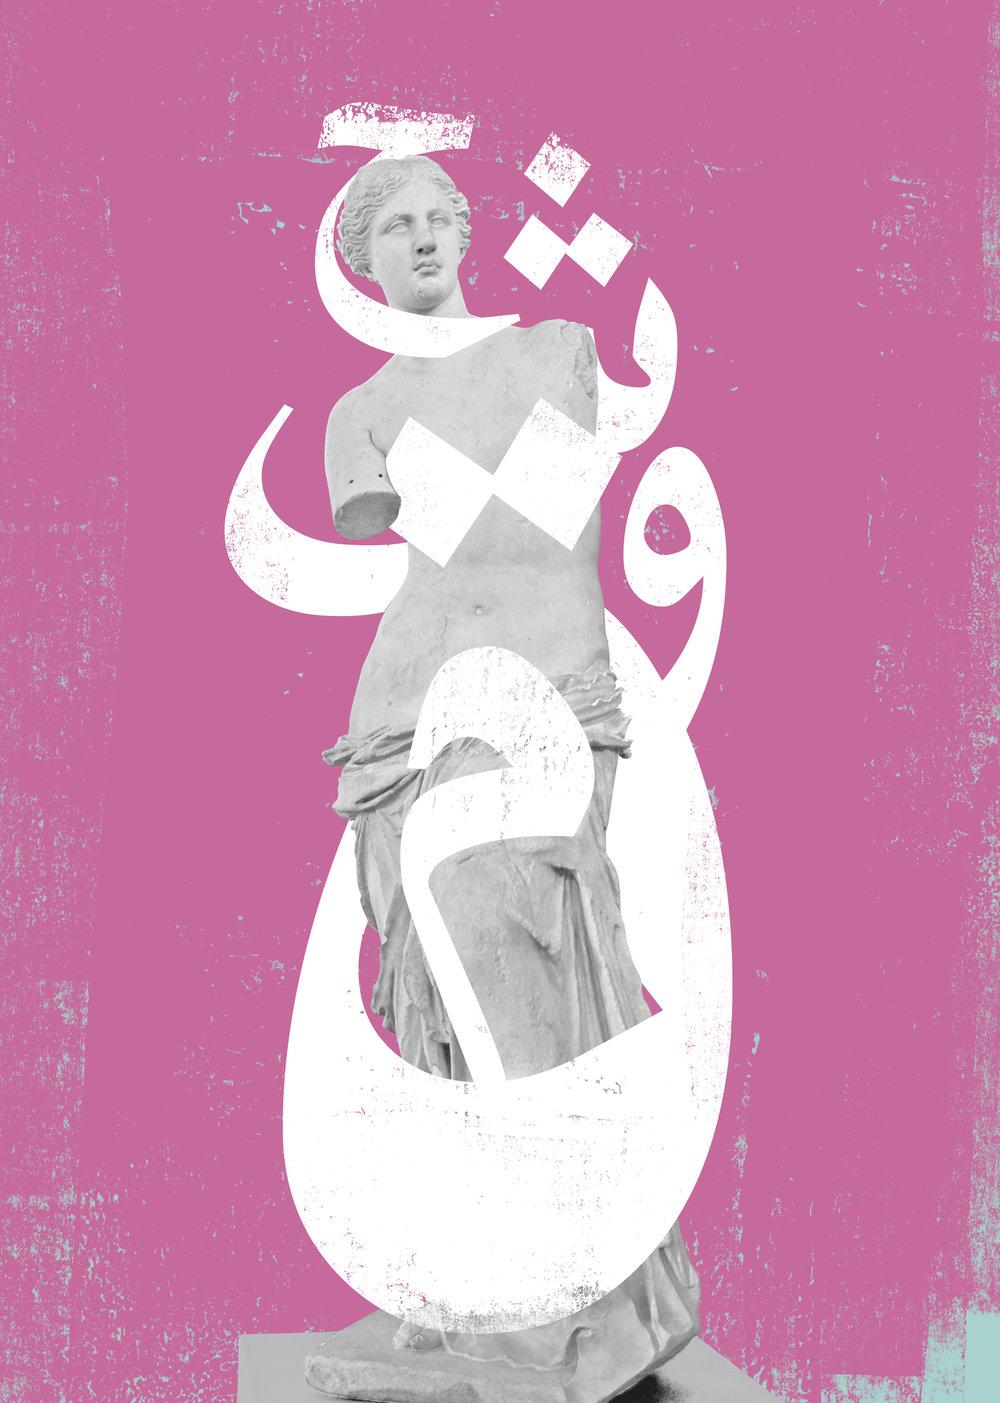 <b>Younes Zemmouri</b></br><i>H'shouma (Shame</i> series)</br>digital art print on archival paper</br>limited edition of 30</br>20 x 16 inches</br>$400 unframed / $600 framed